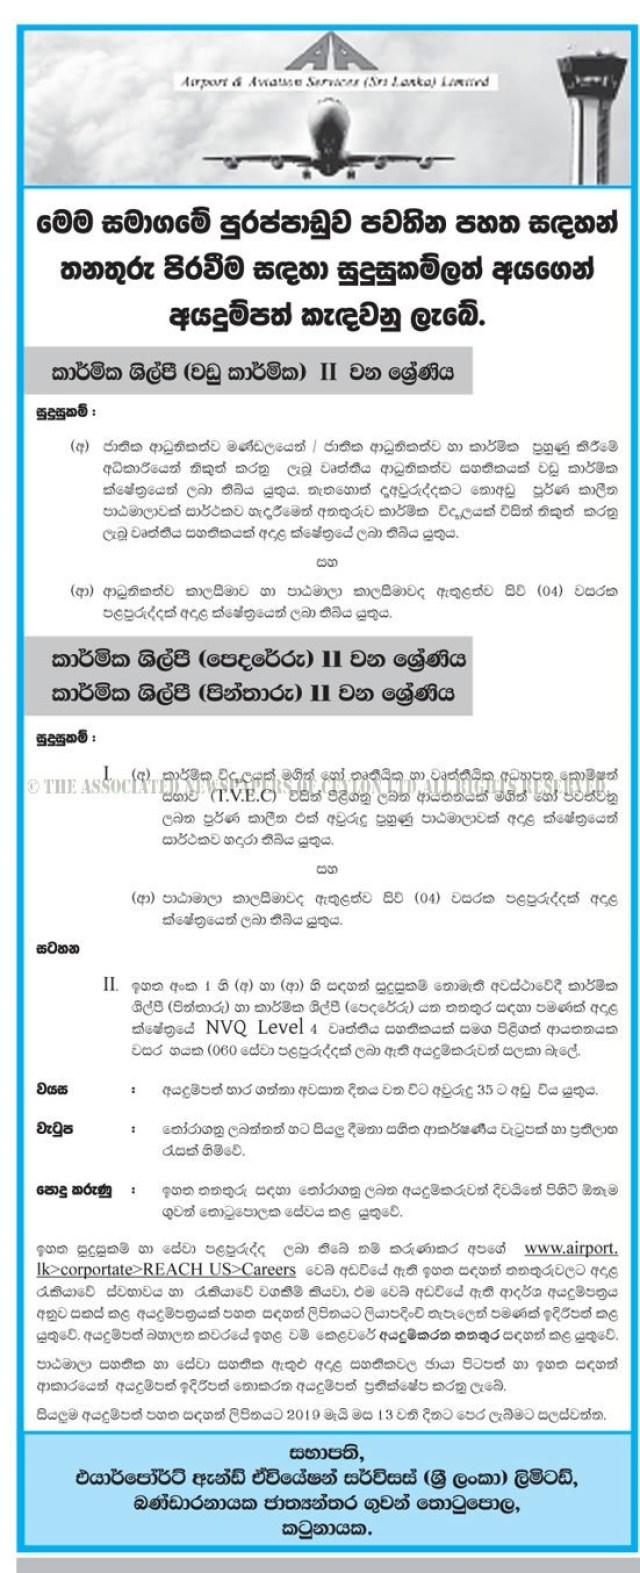 Sri Lanka Government Job Vacancies 2019